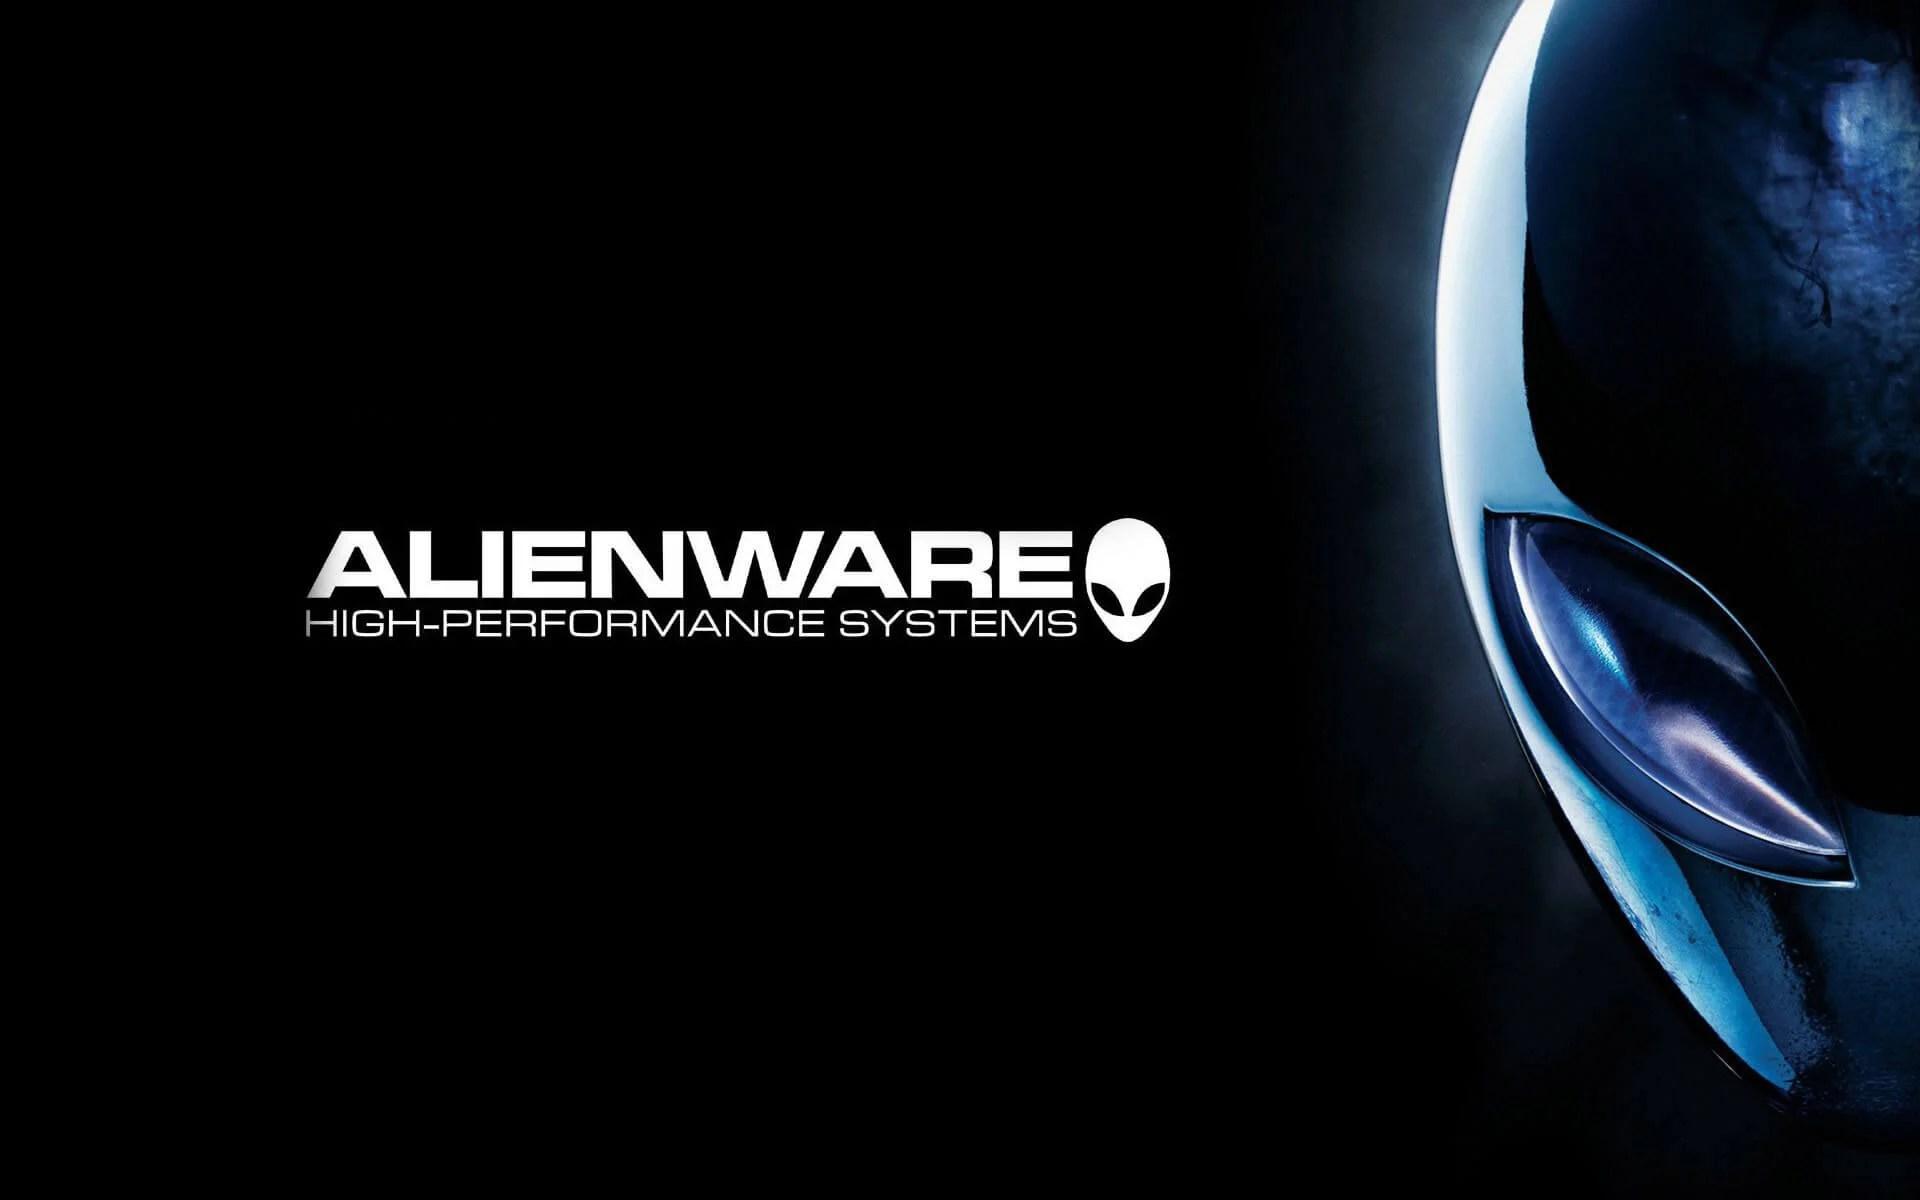 alienware logo pictures 20 spectacular - Dell atualiza Alienware no Brasil com série 10 de placas de vídeo NVIDIA